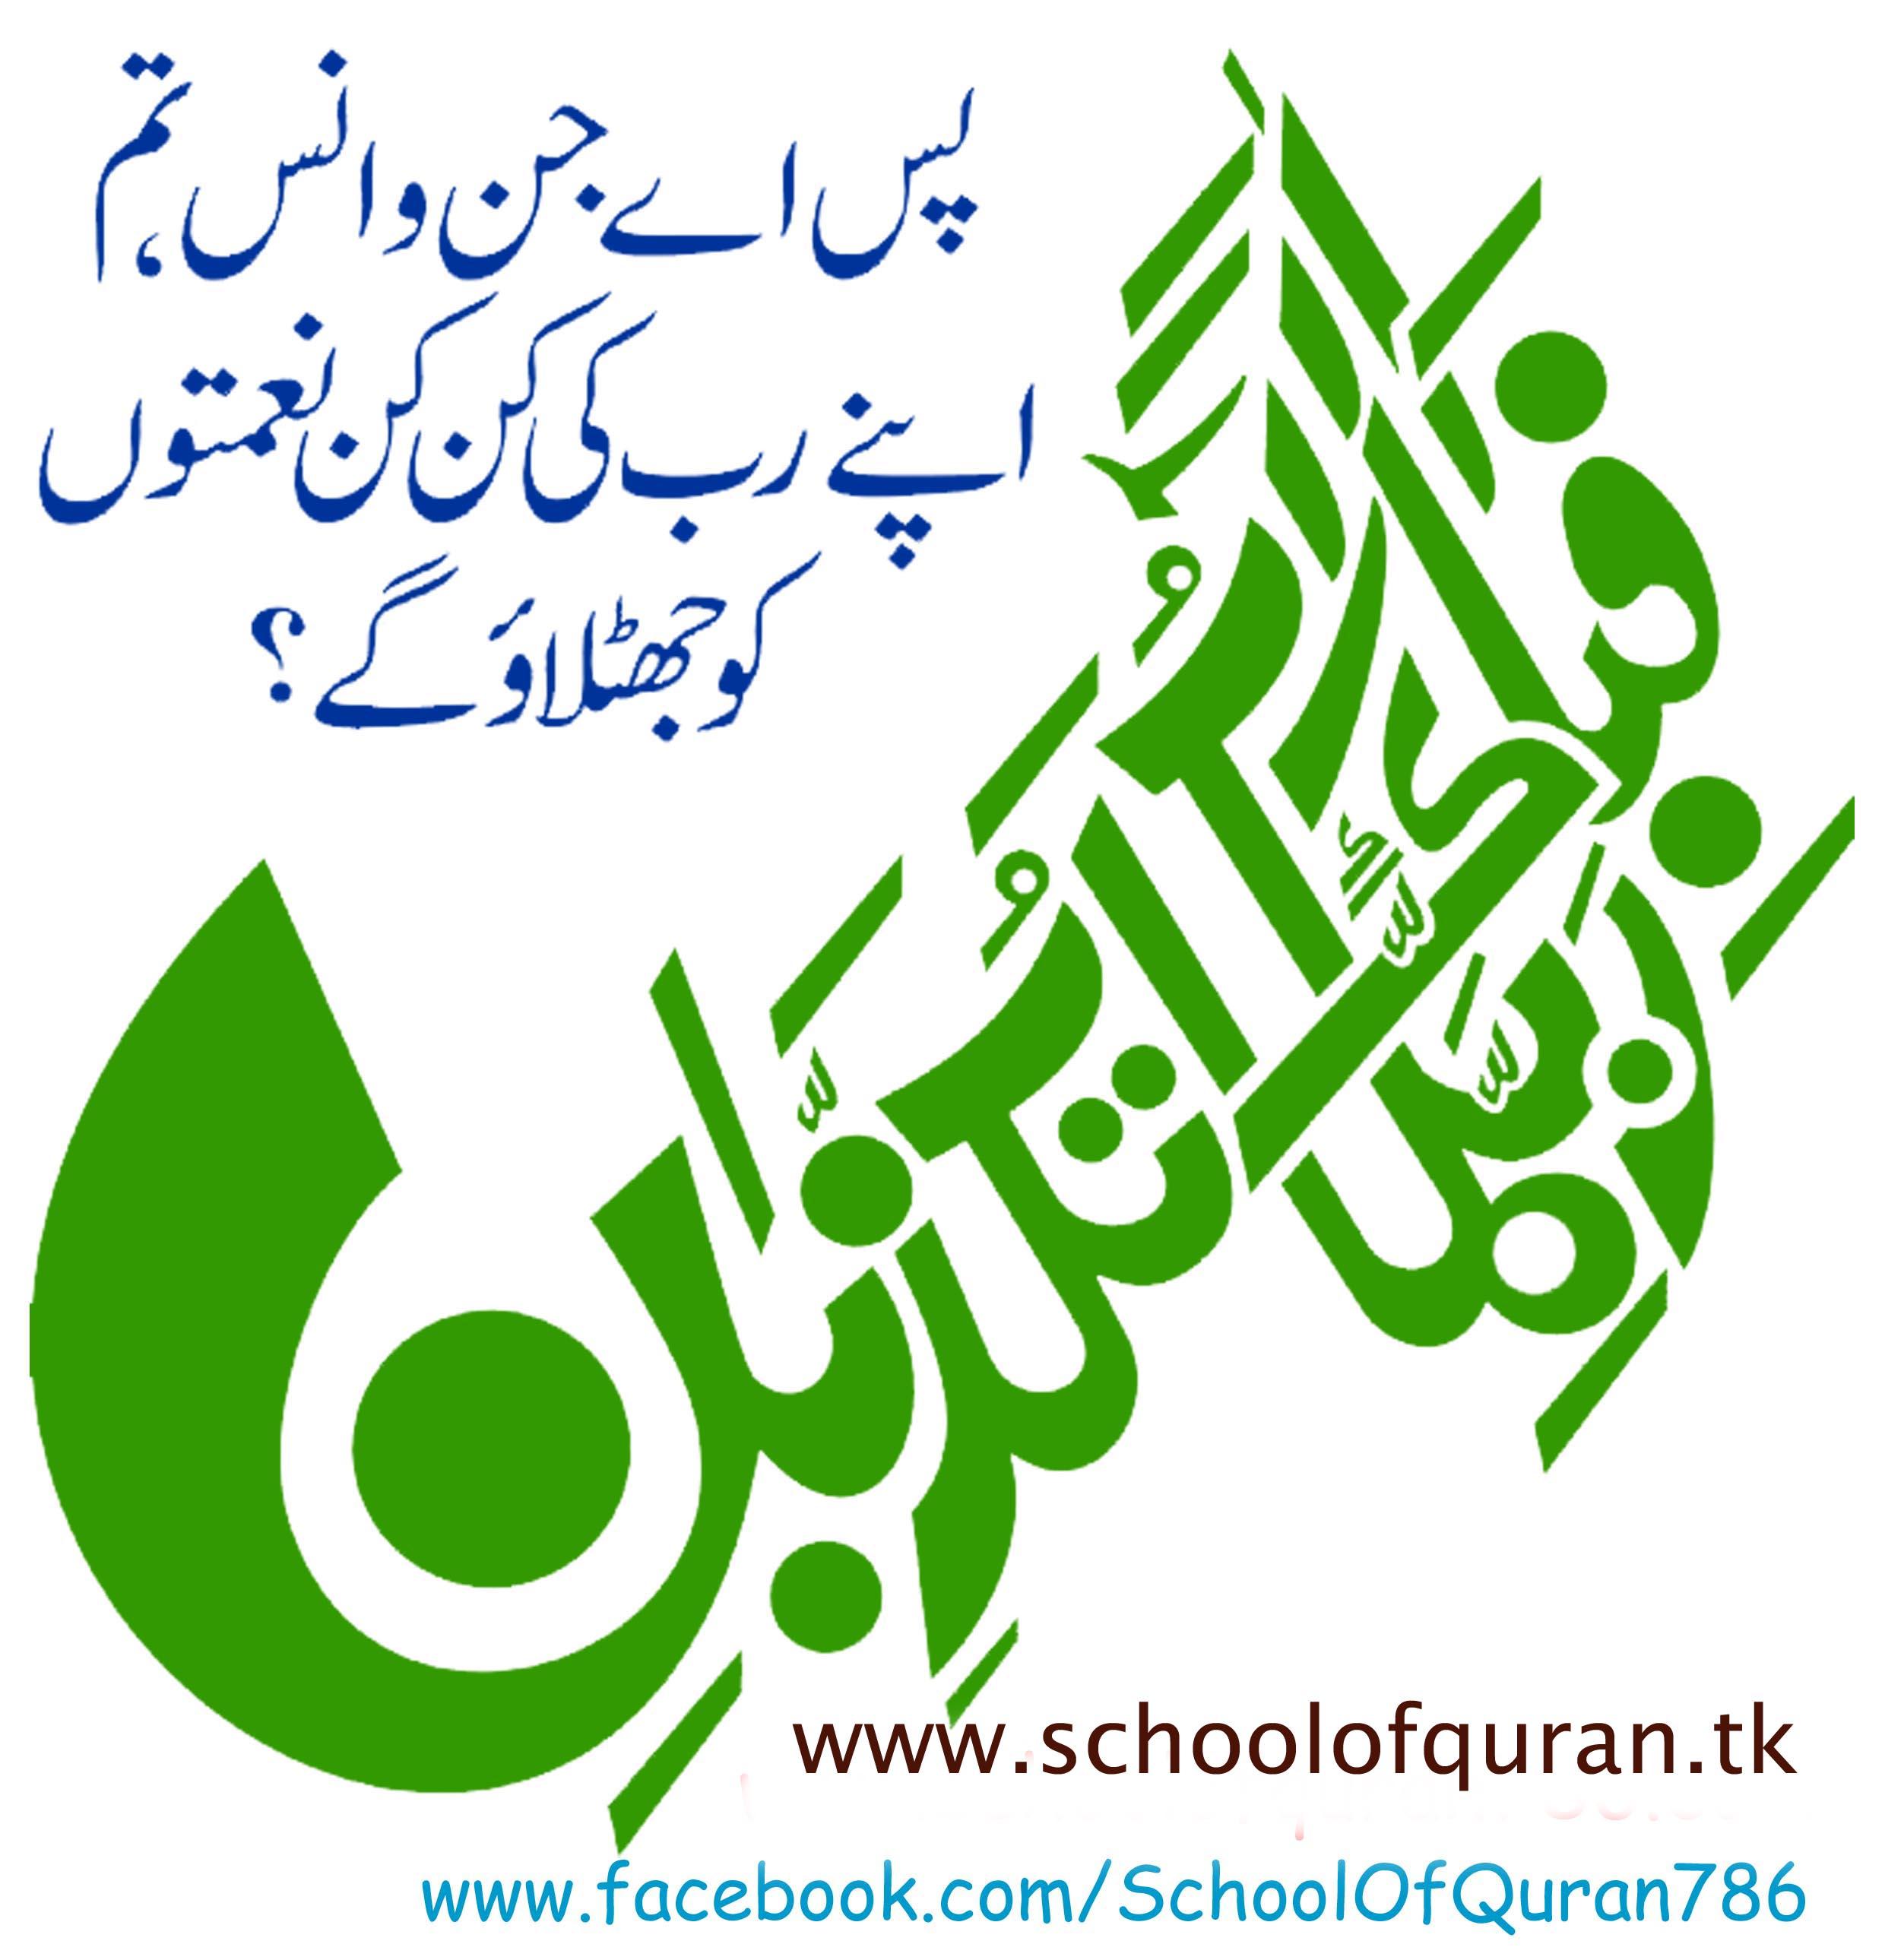 Online Calendaring Free Self Calendaring Central District Of California United Quran Software Free Urdu Translation Filecloudvita